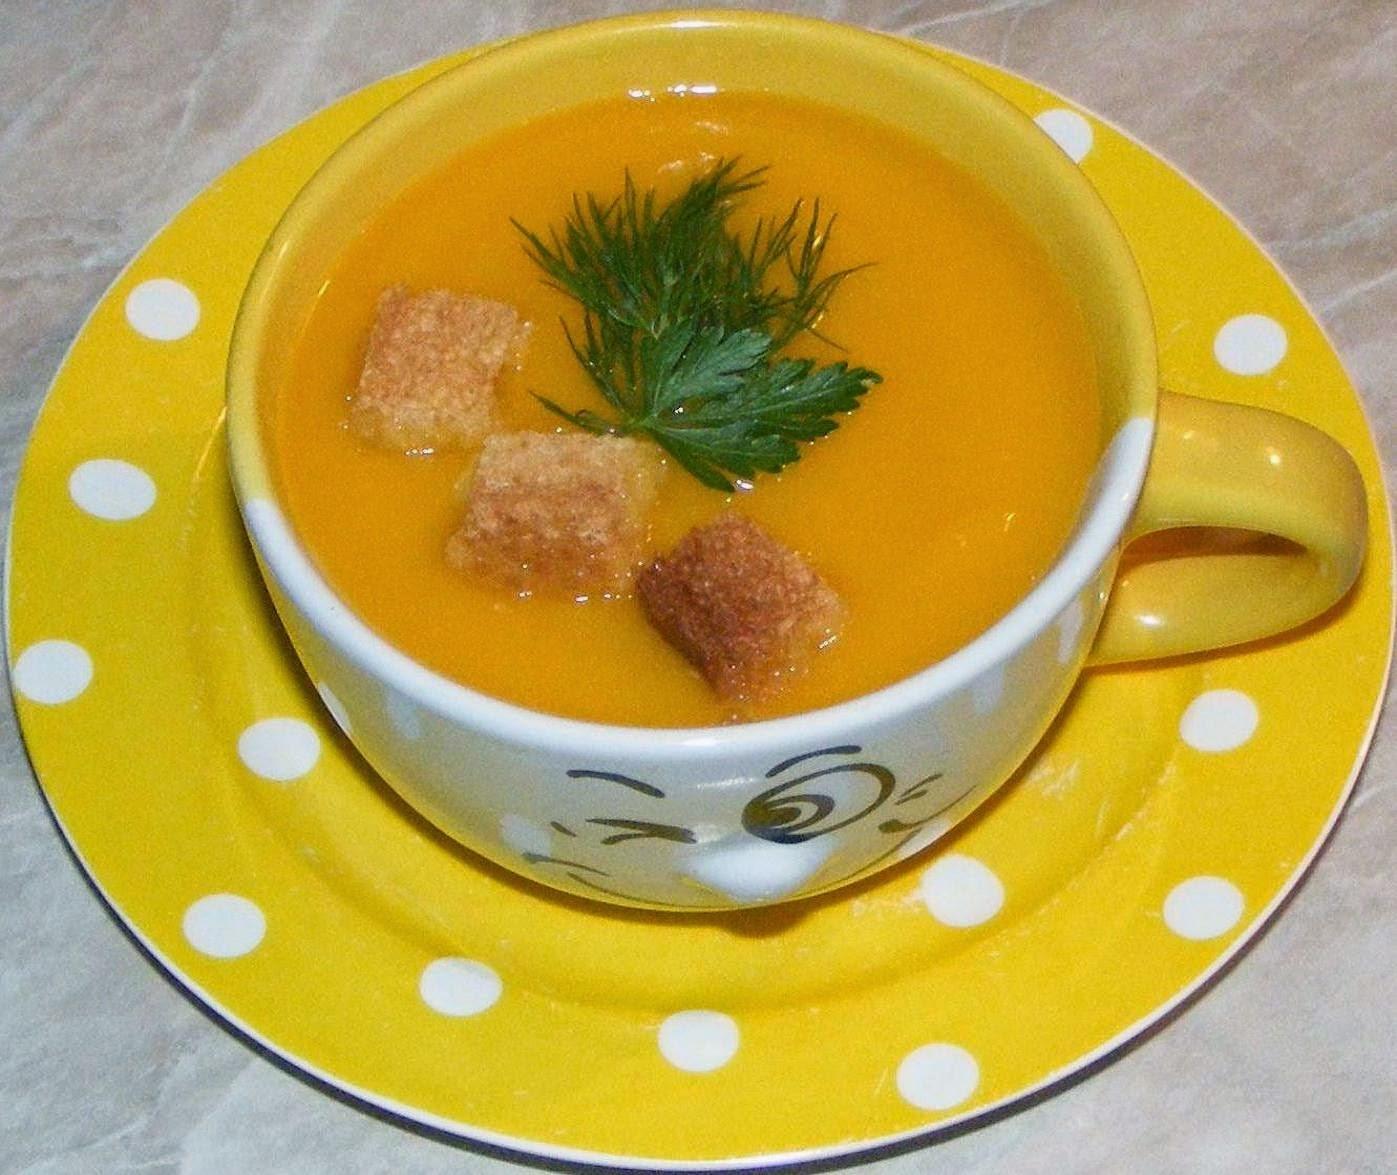 supa crema de dovleac, supa crema de legume, retete de post, retete de mancare, retete culinare, supa de dovleac, supe creme, supa crema, retete cu dovleac, reteta supa crema, supa crema de dovleac galben, supa crema de dovleac de post cu crutoane, cura, cure, slabeste sanataos, preparate din dovleac, diete,